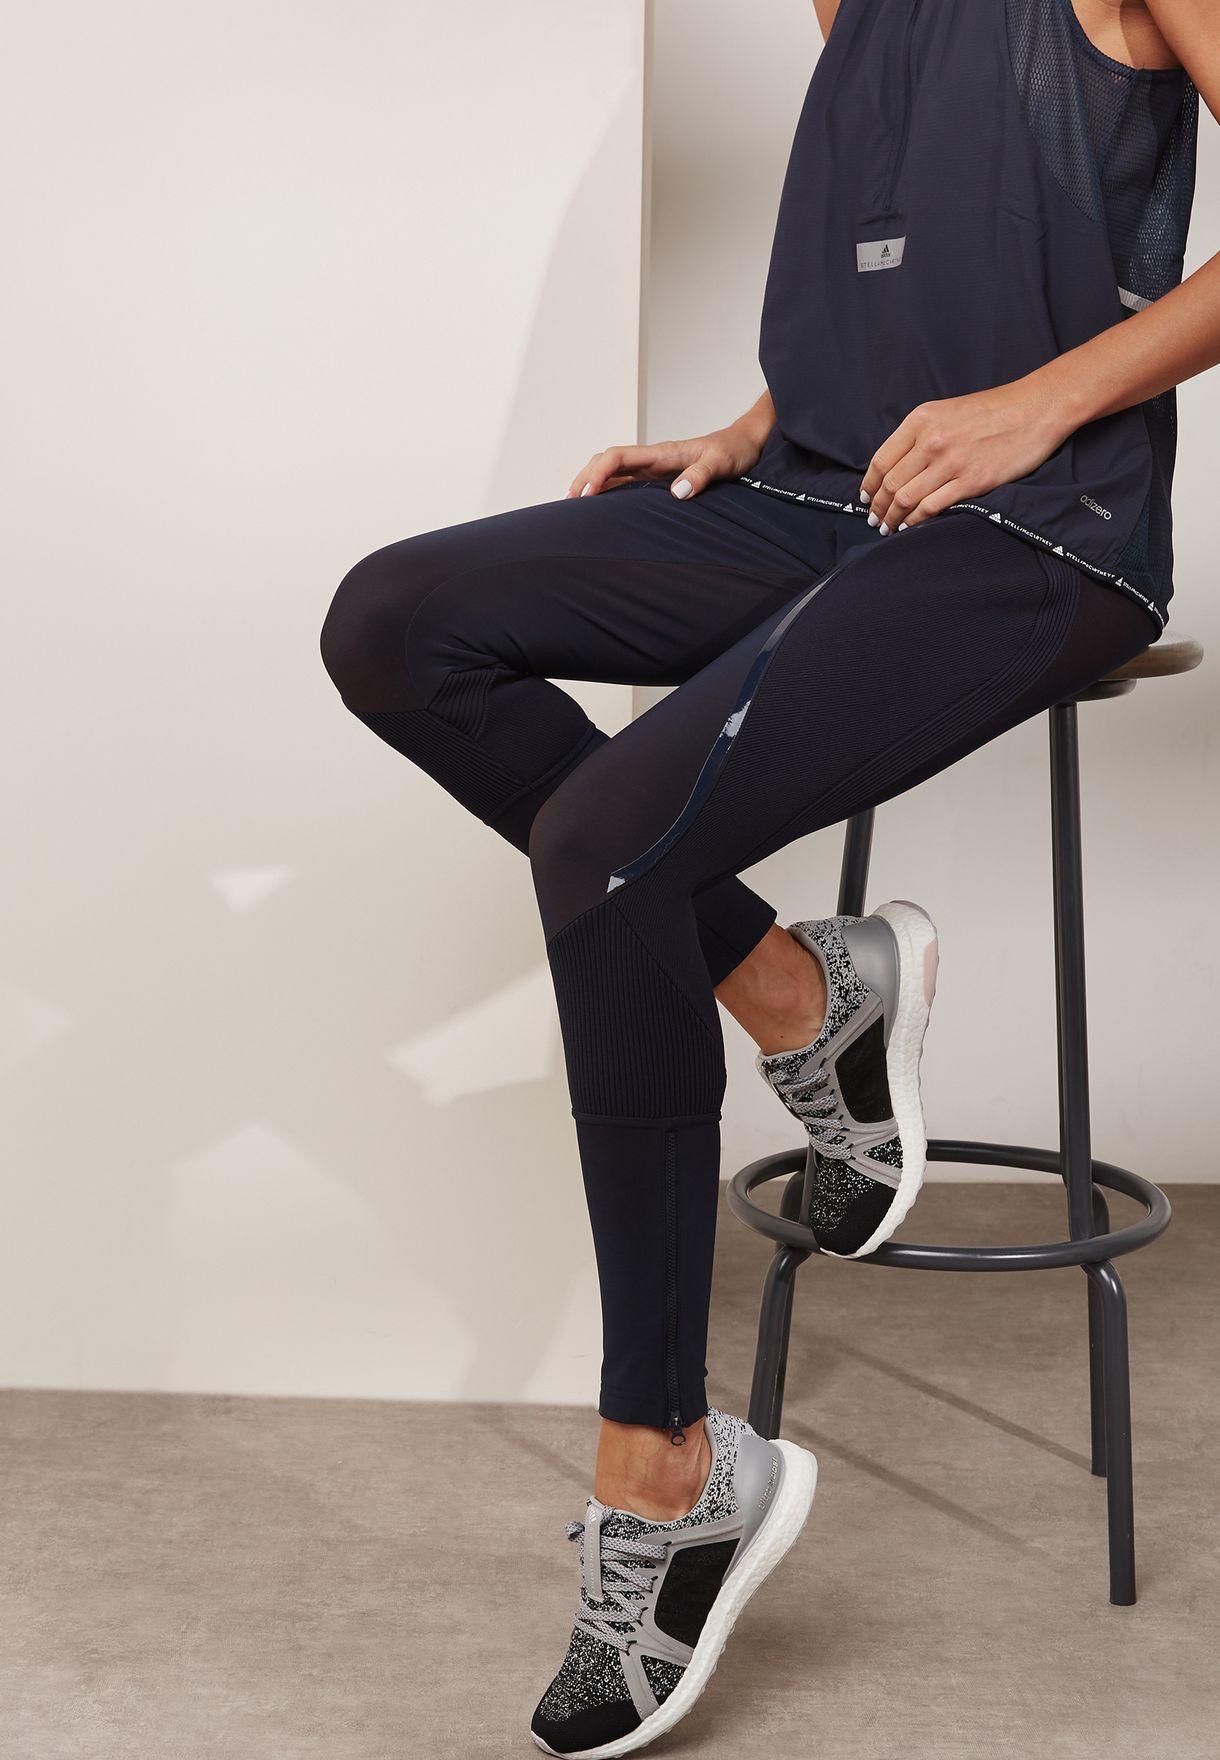 b654318360e02e Shop adidas by Stella McCartney navy Knit Mix Tights BQ8321 for ...